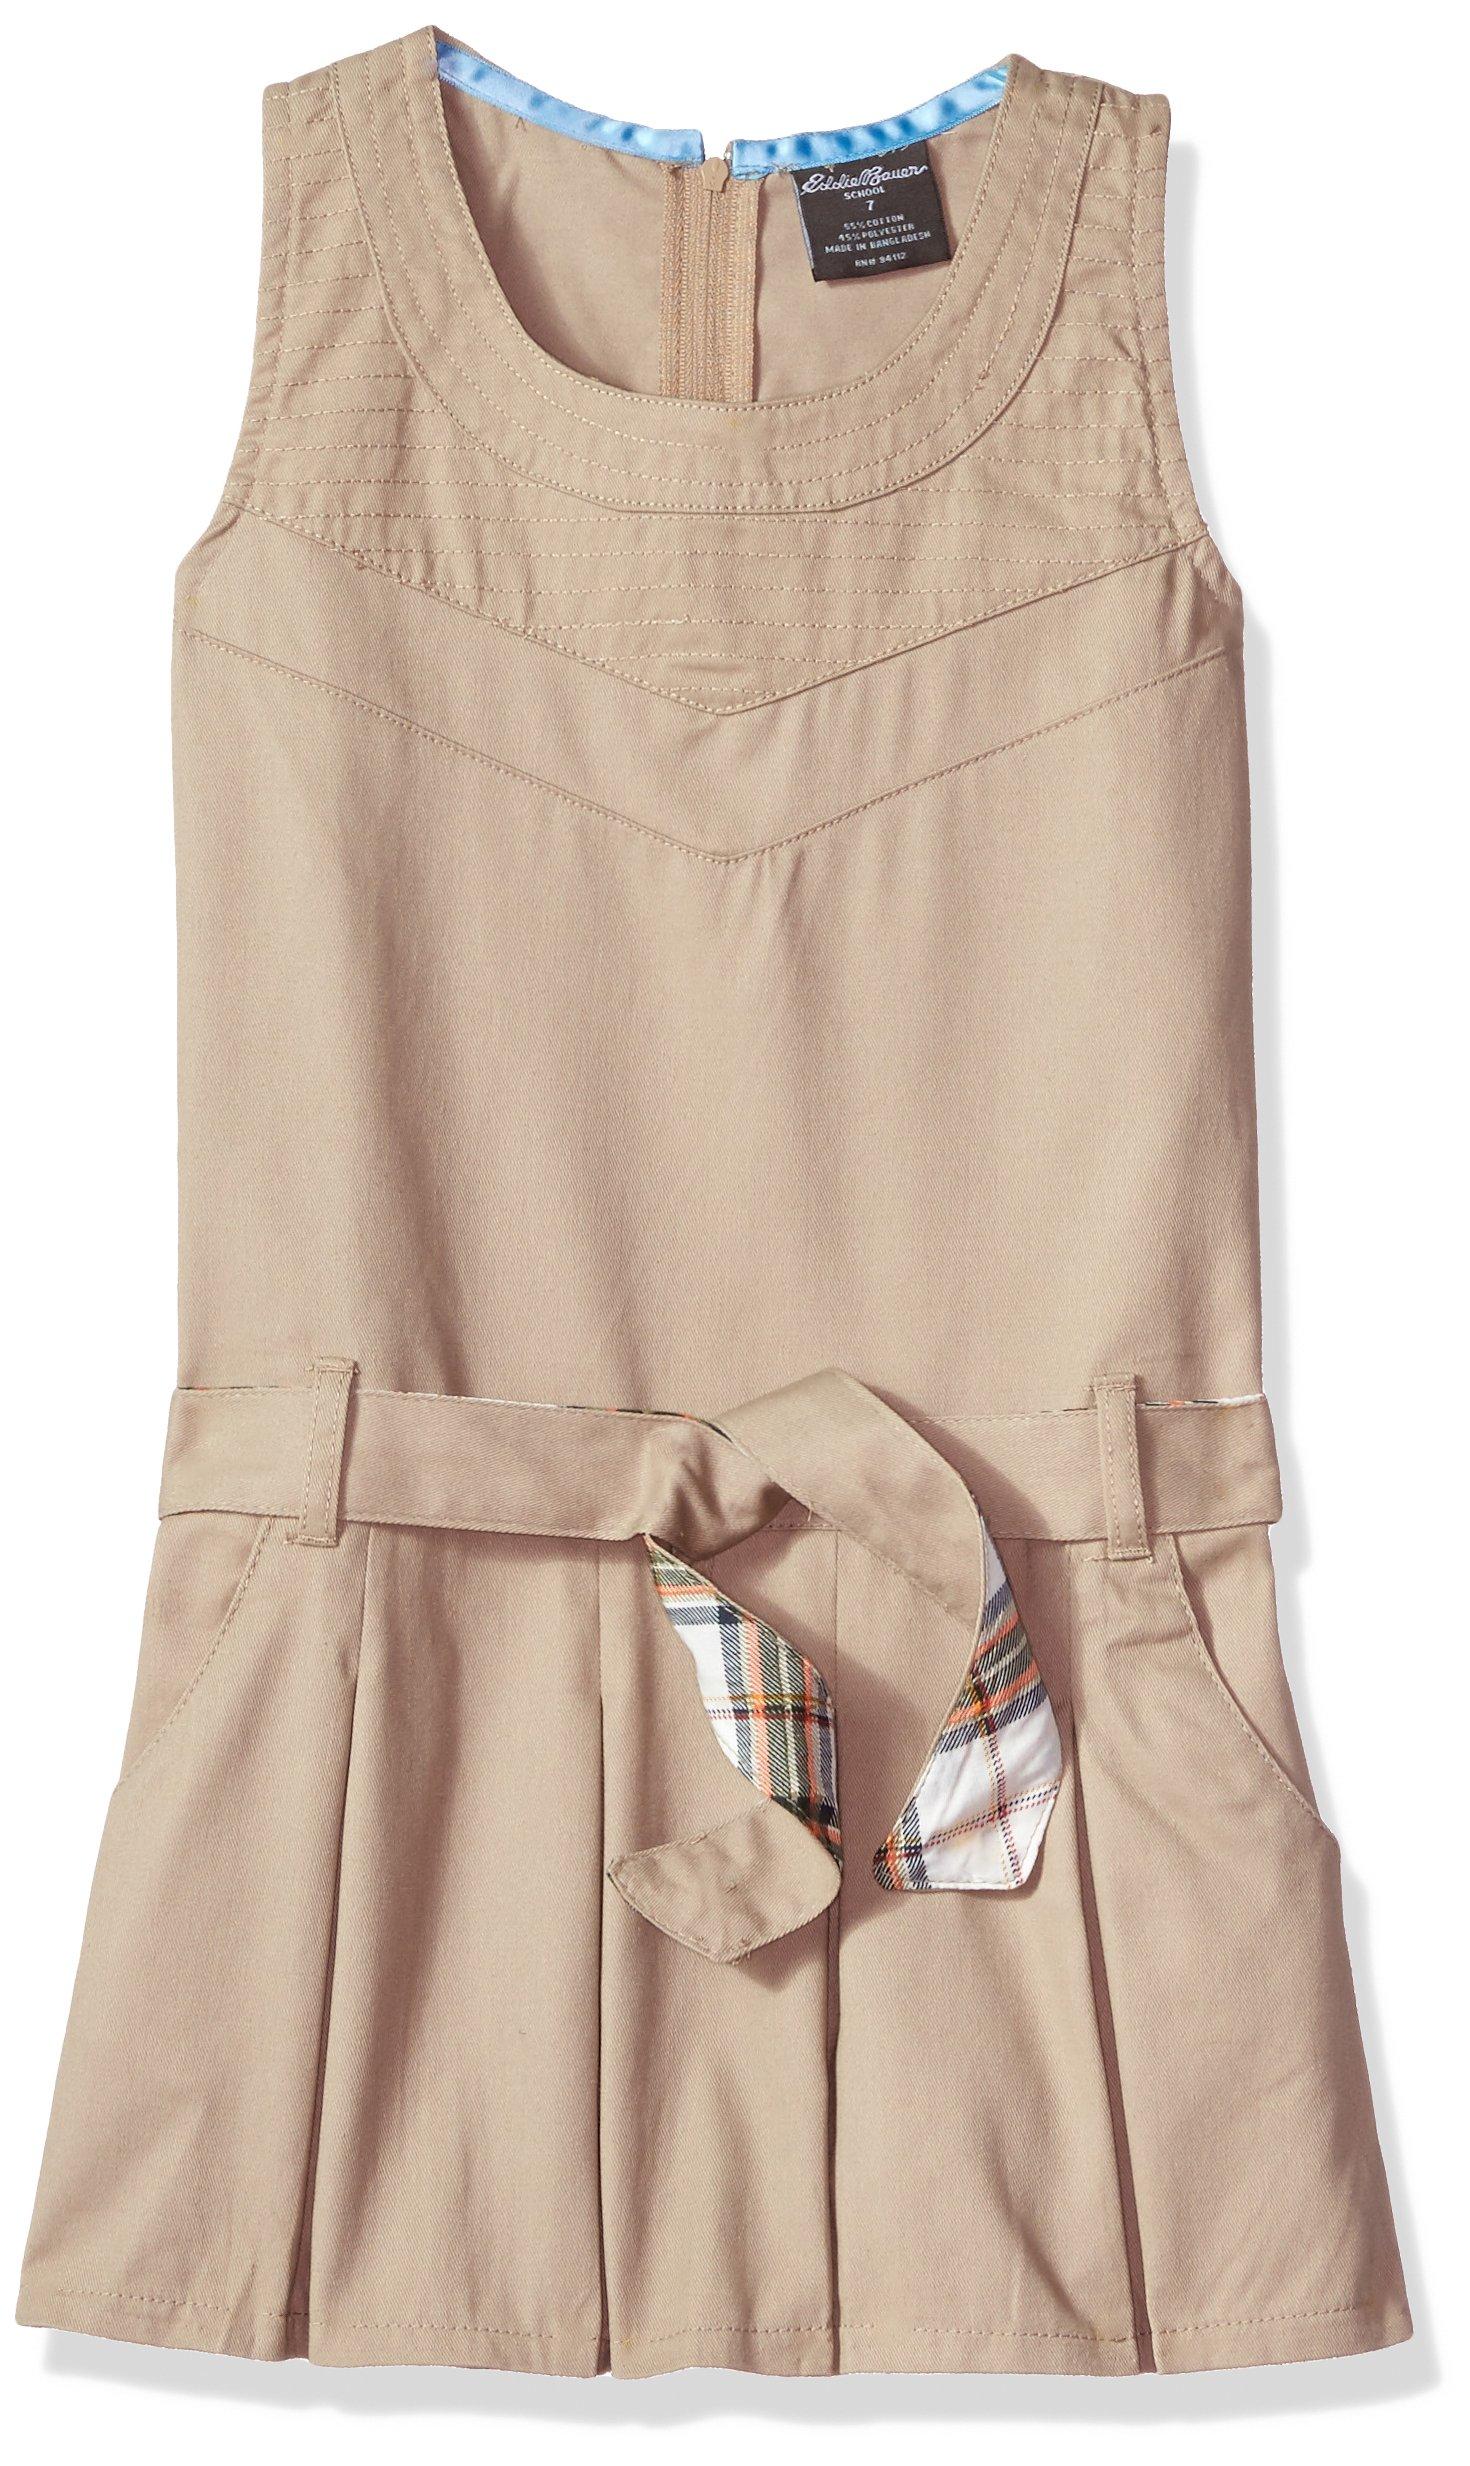 Eddie Bauer Girls' Dress Jumper (More Styles Available), Warm Khaki, 7